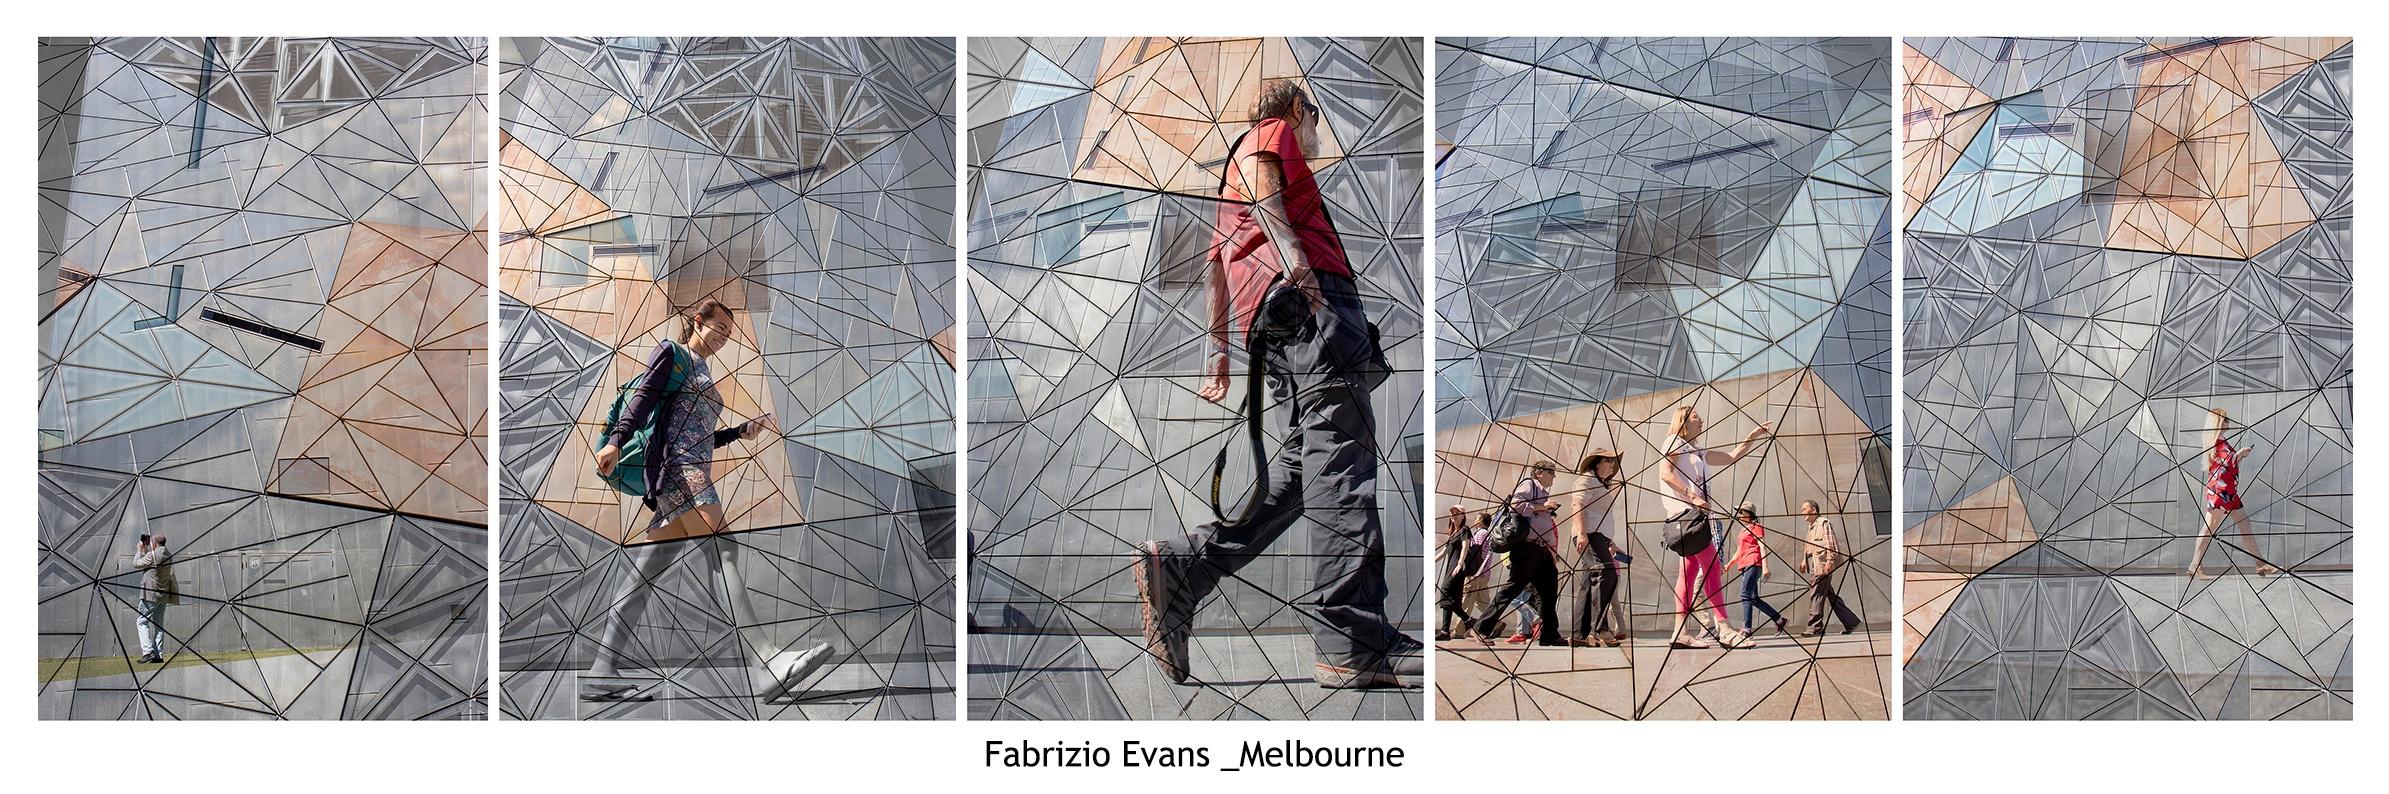 Melbourne-Fabrizio Evans